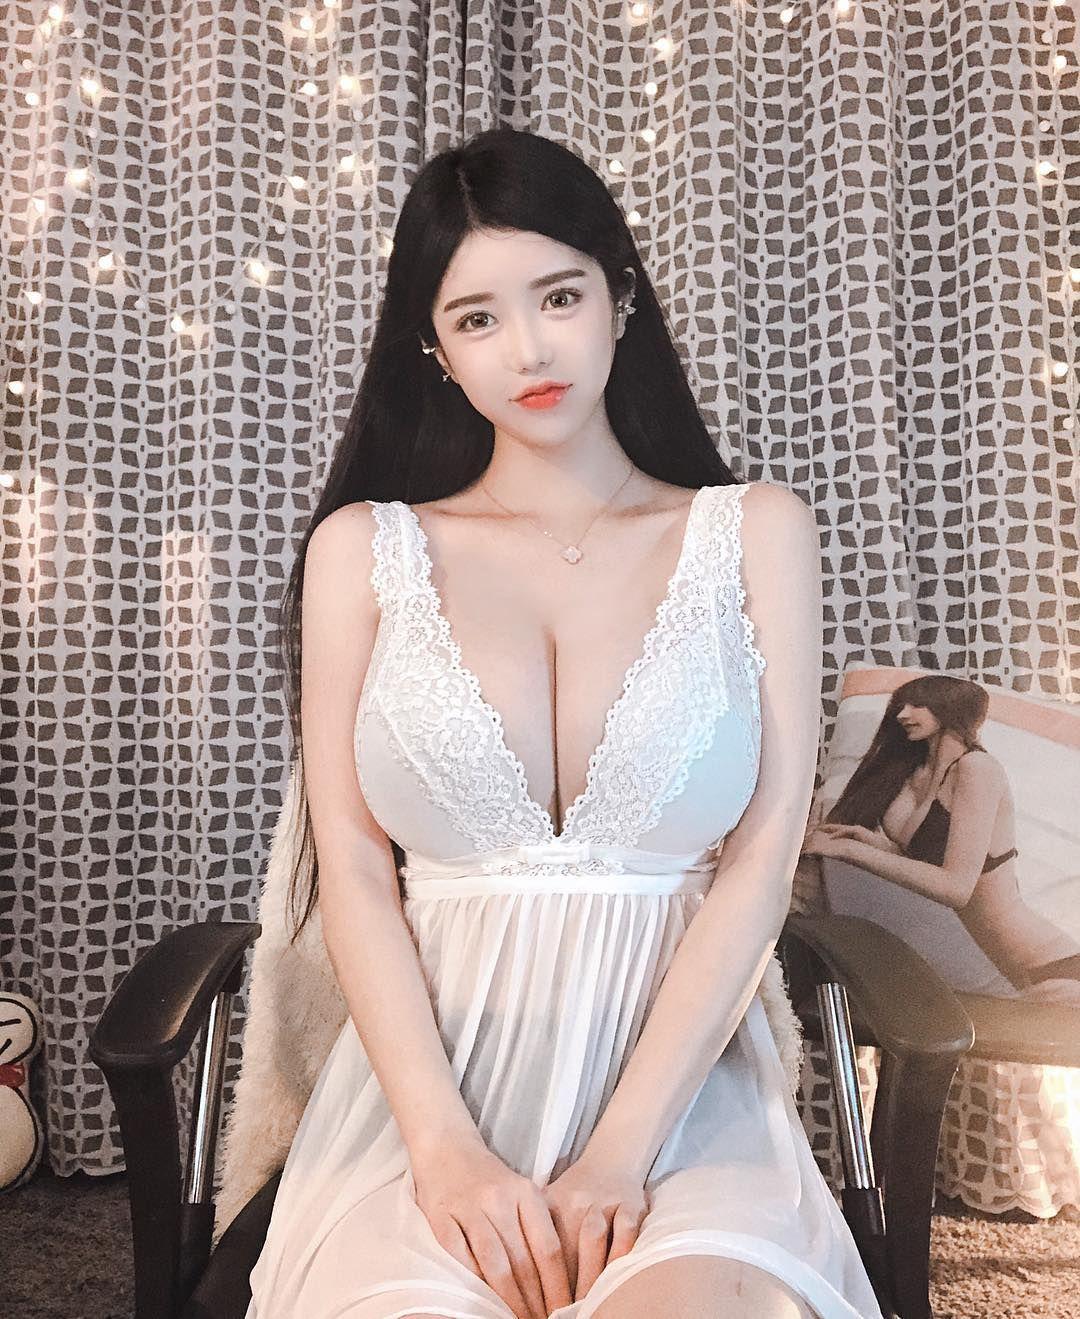 Asian bikini links